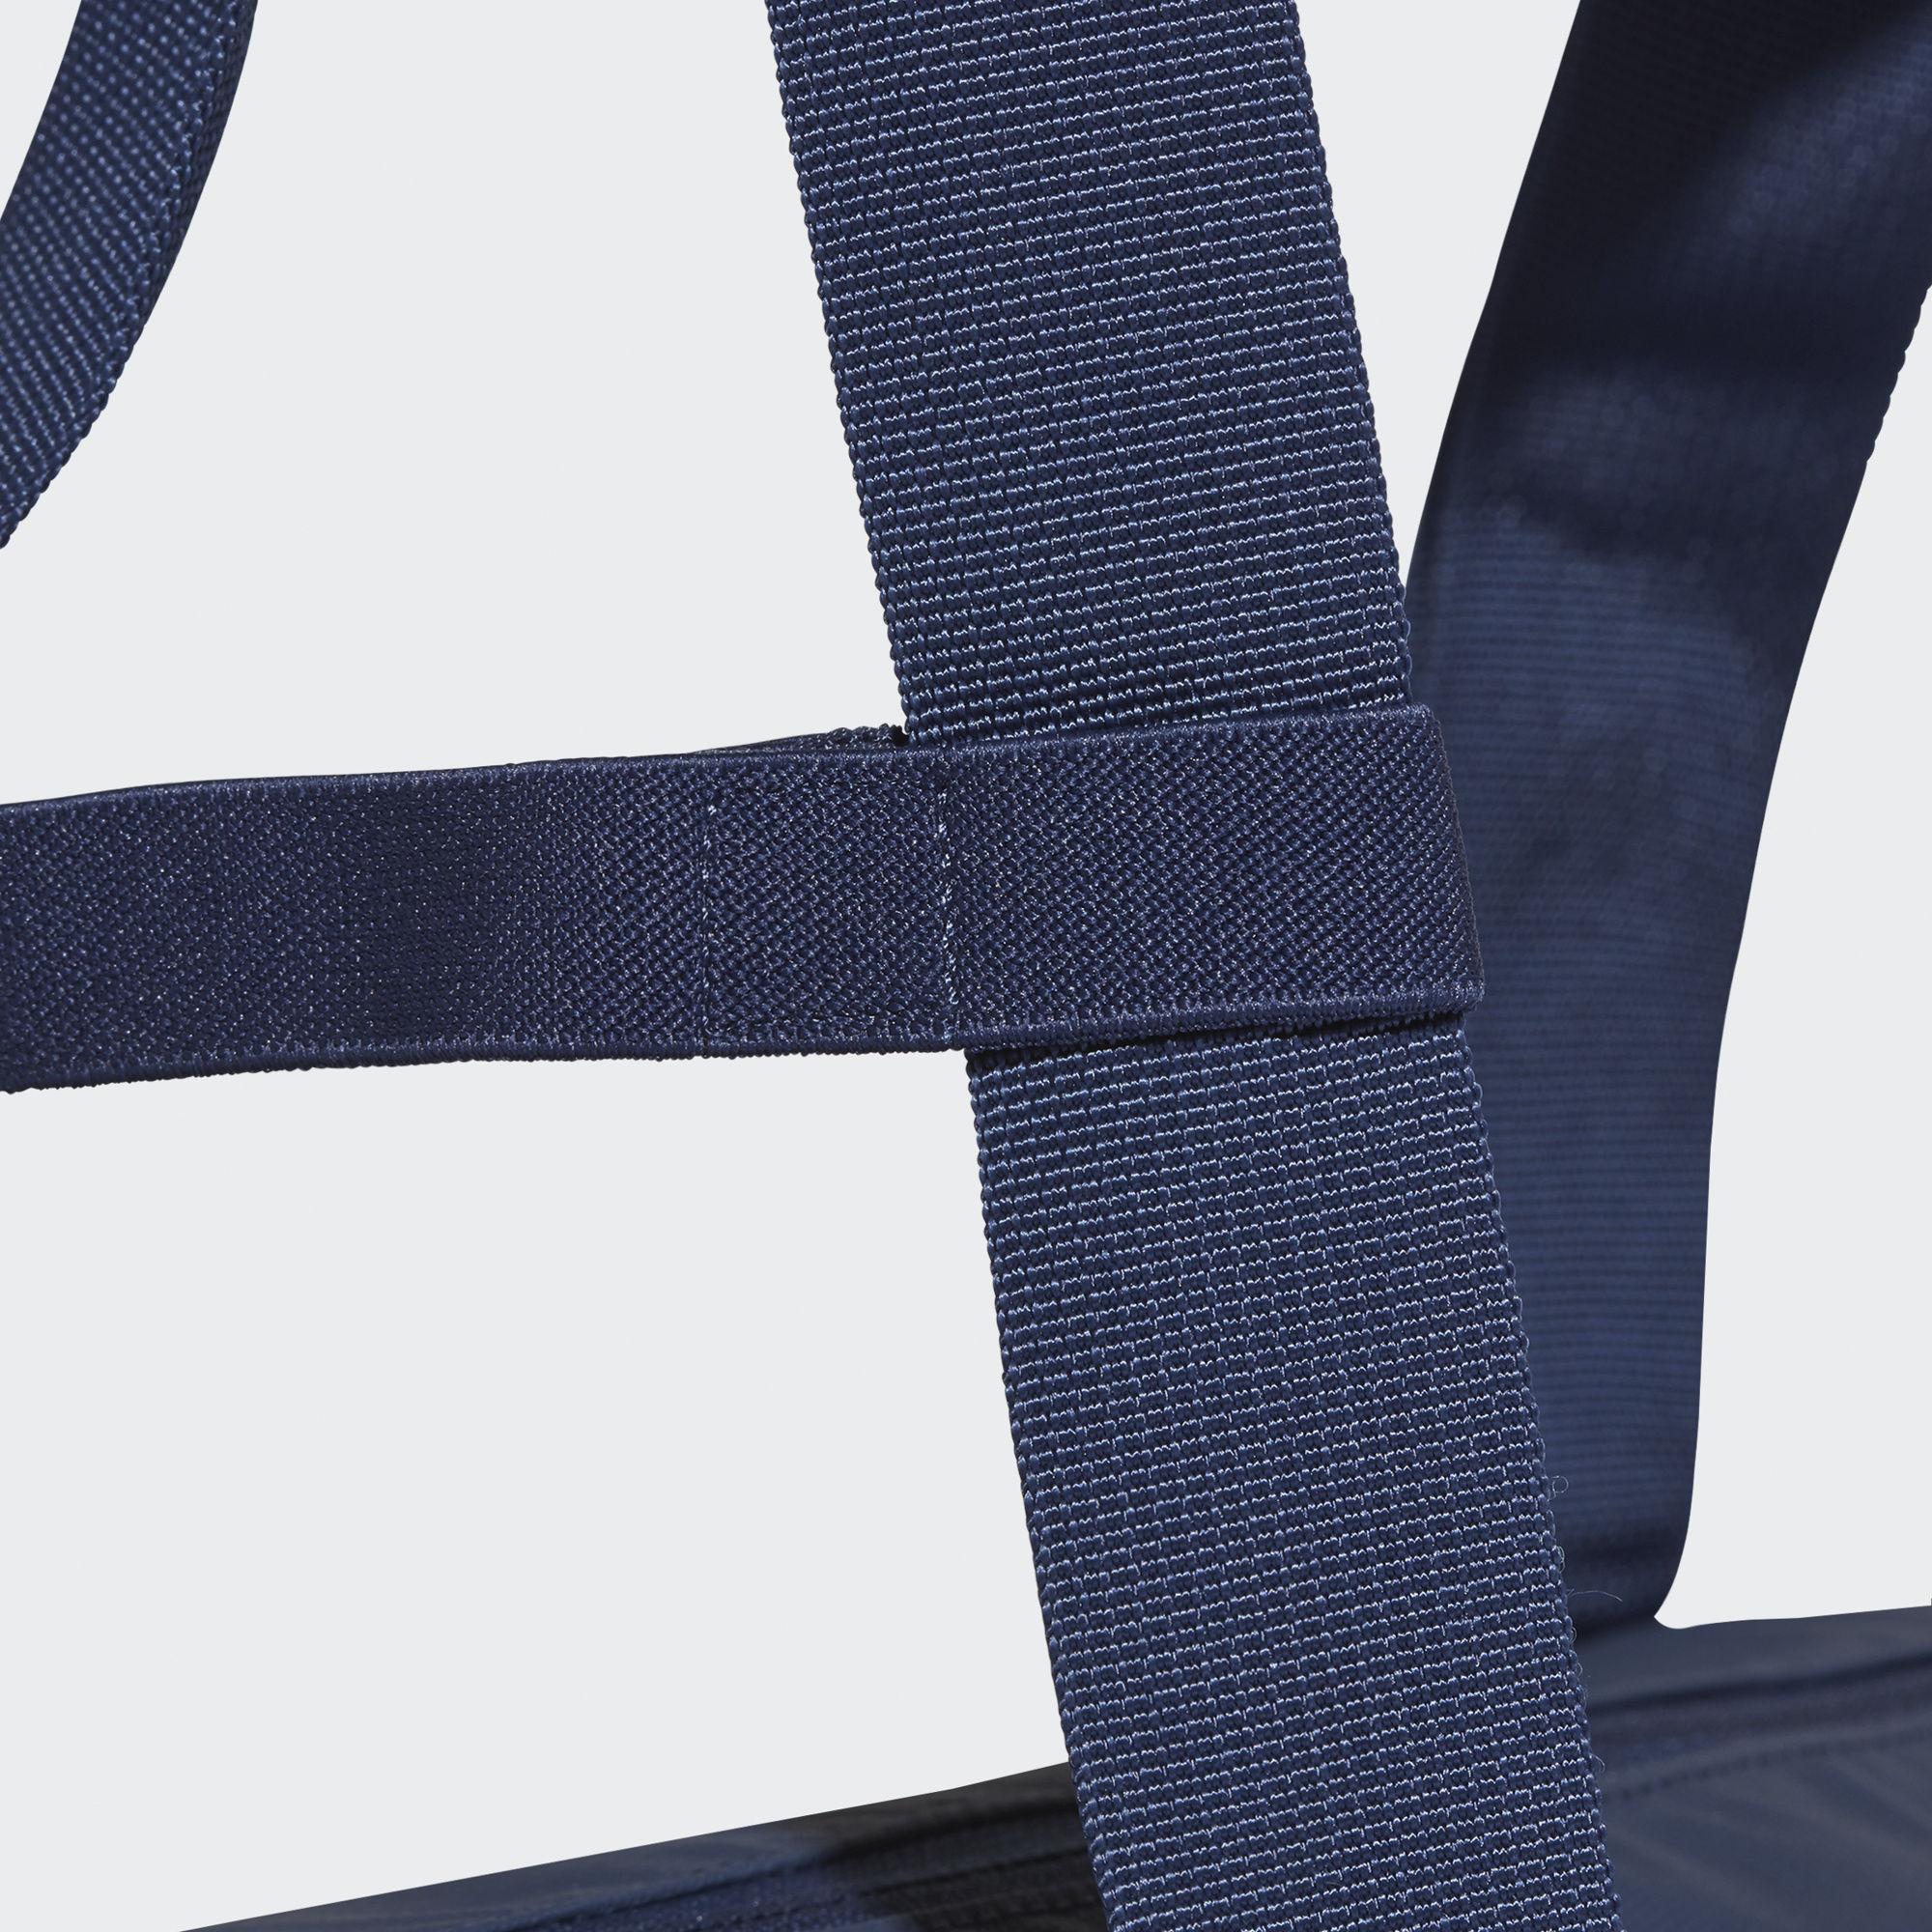 991fdc2dfaaf Спортивная сумка Convertible Training CF3270 adidas Performance ...